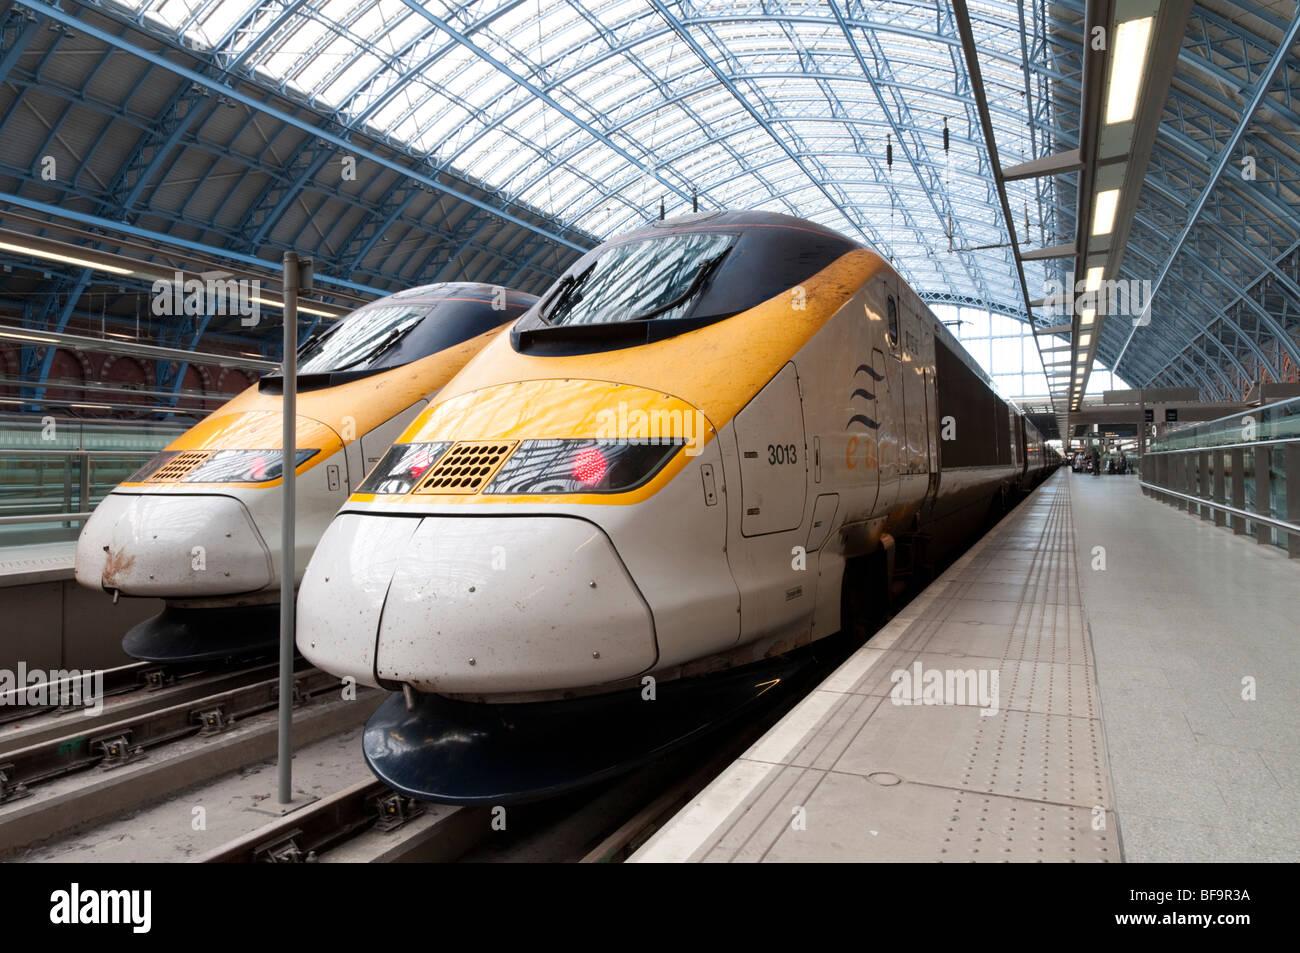 Eurostar trains in St Pancras International station, London, England, UK - Stock Image